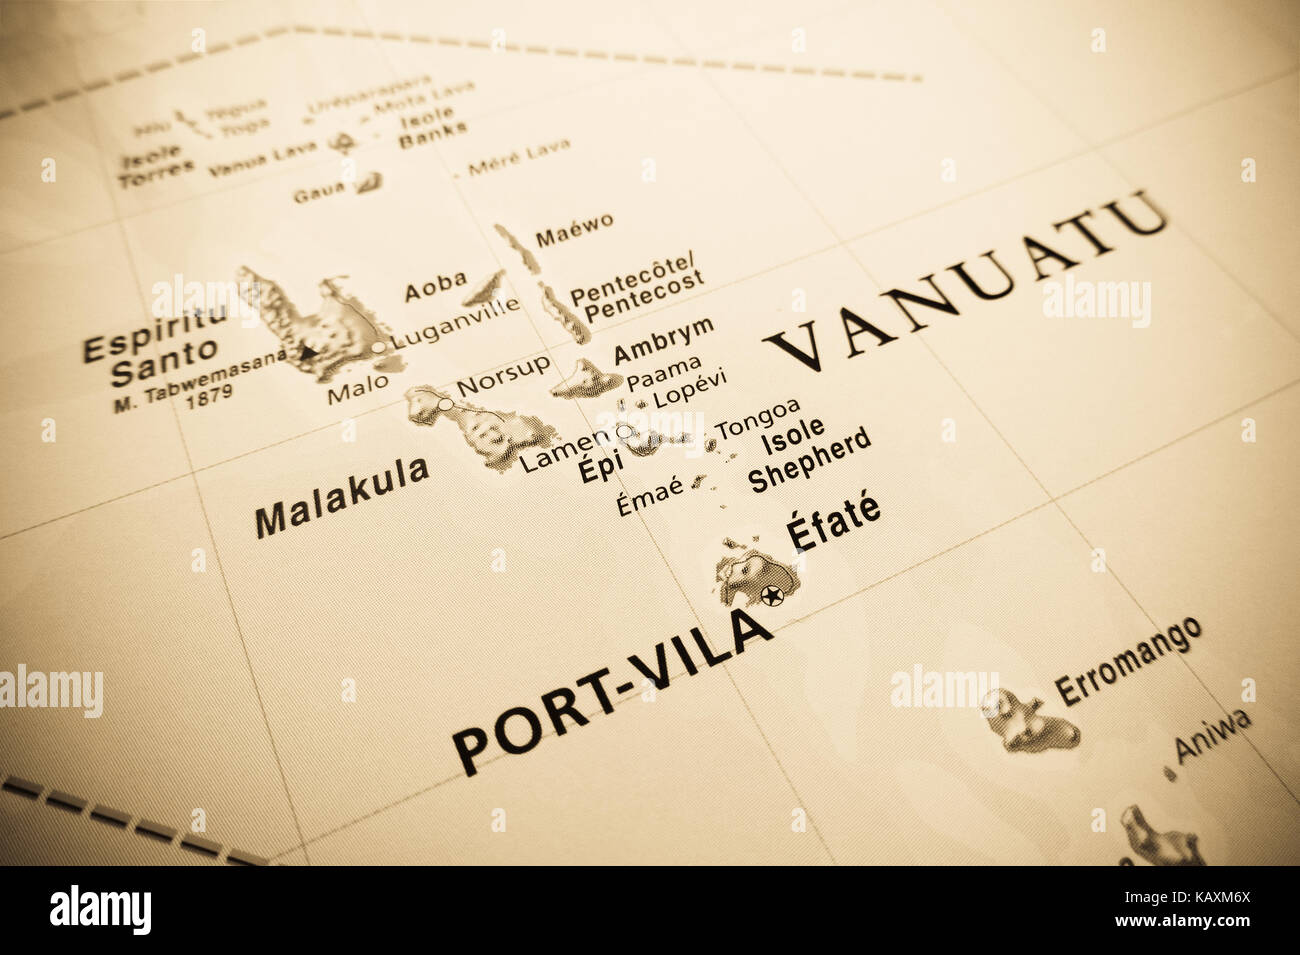 Vanuatu islands map - Stock Image